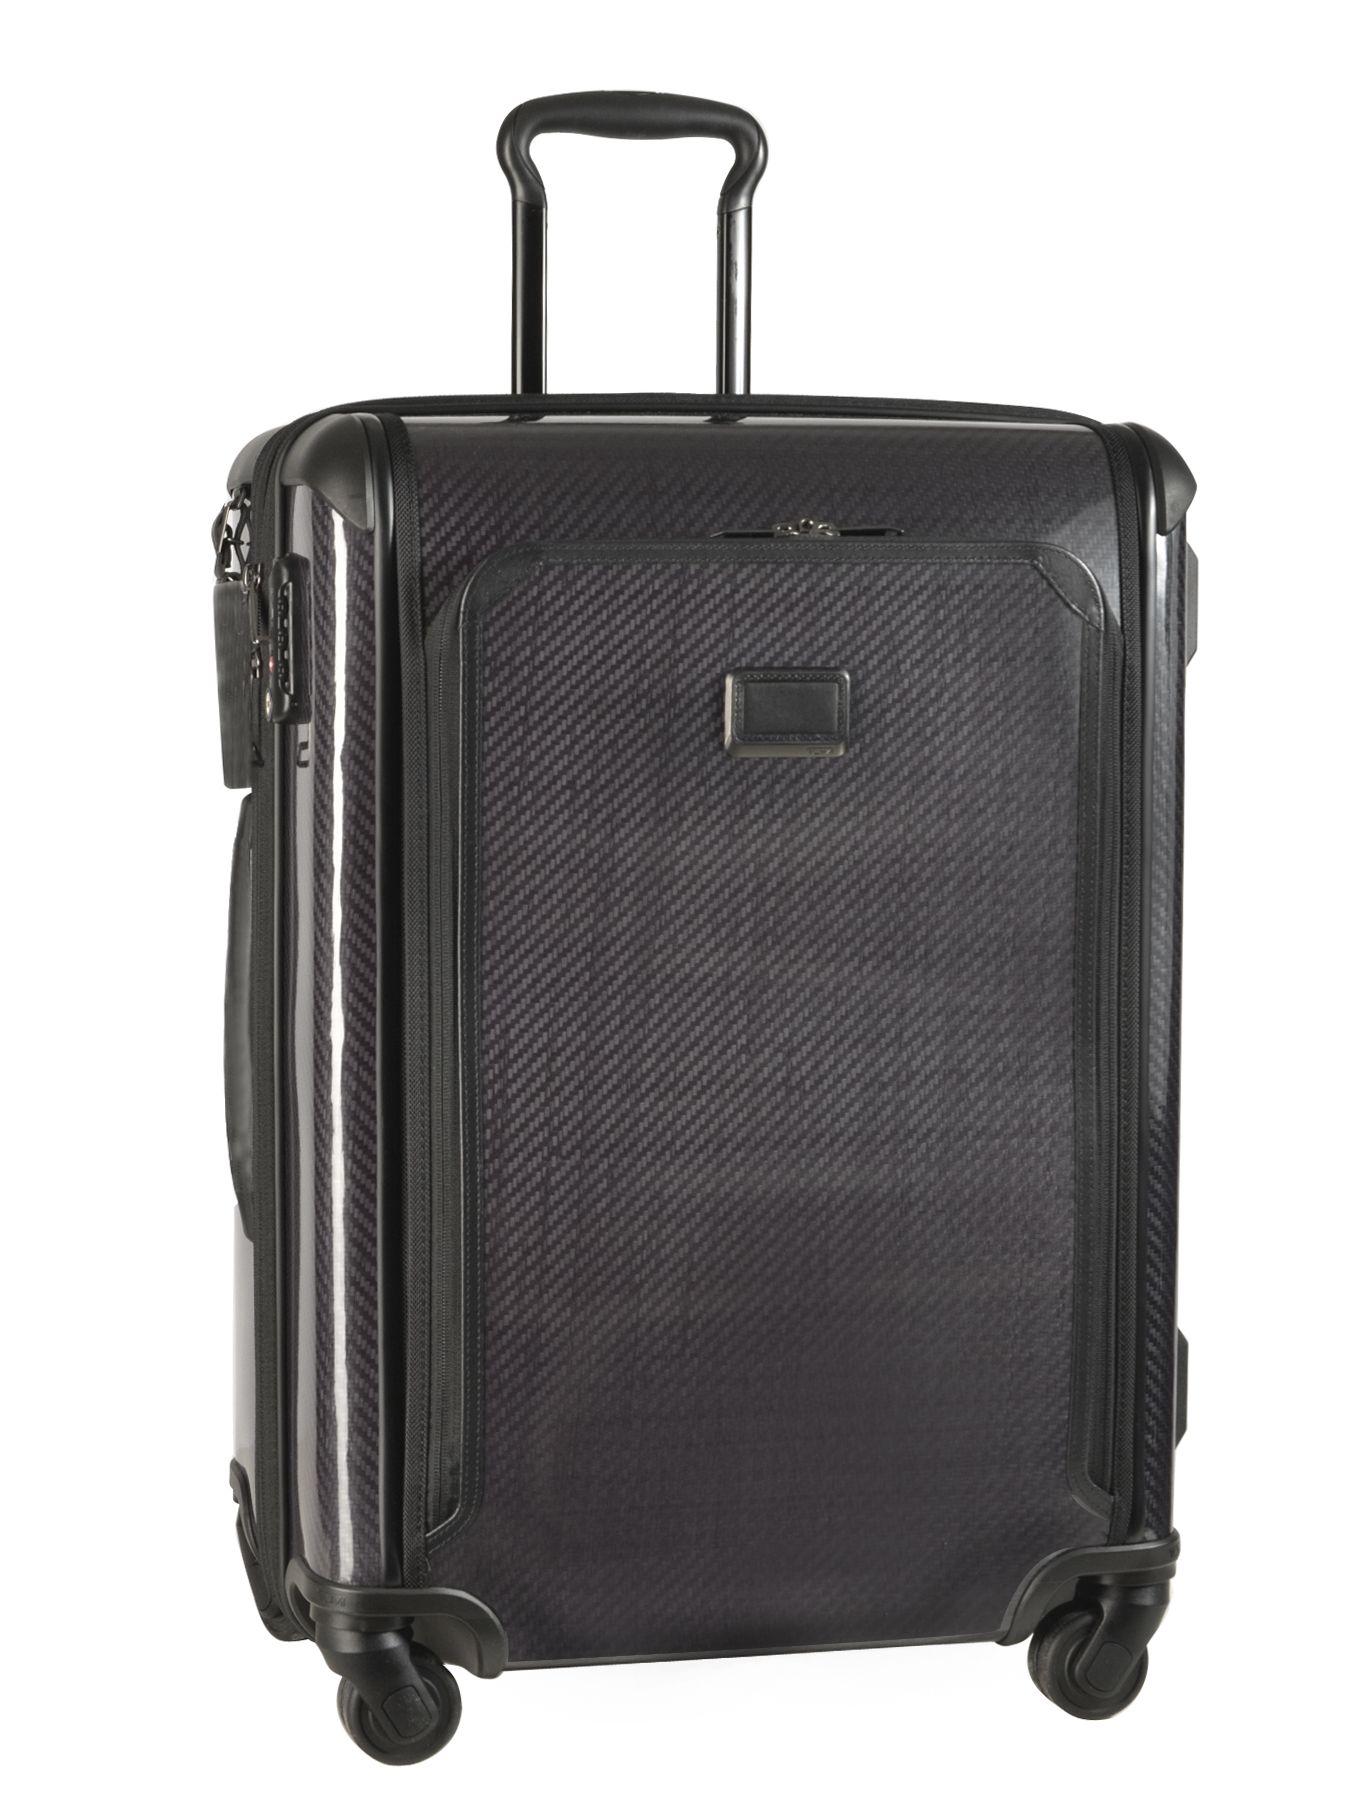 Hardside Luggage Tegramax Tumi Gray tegramax 28724